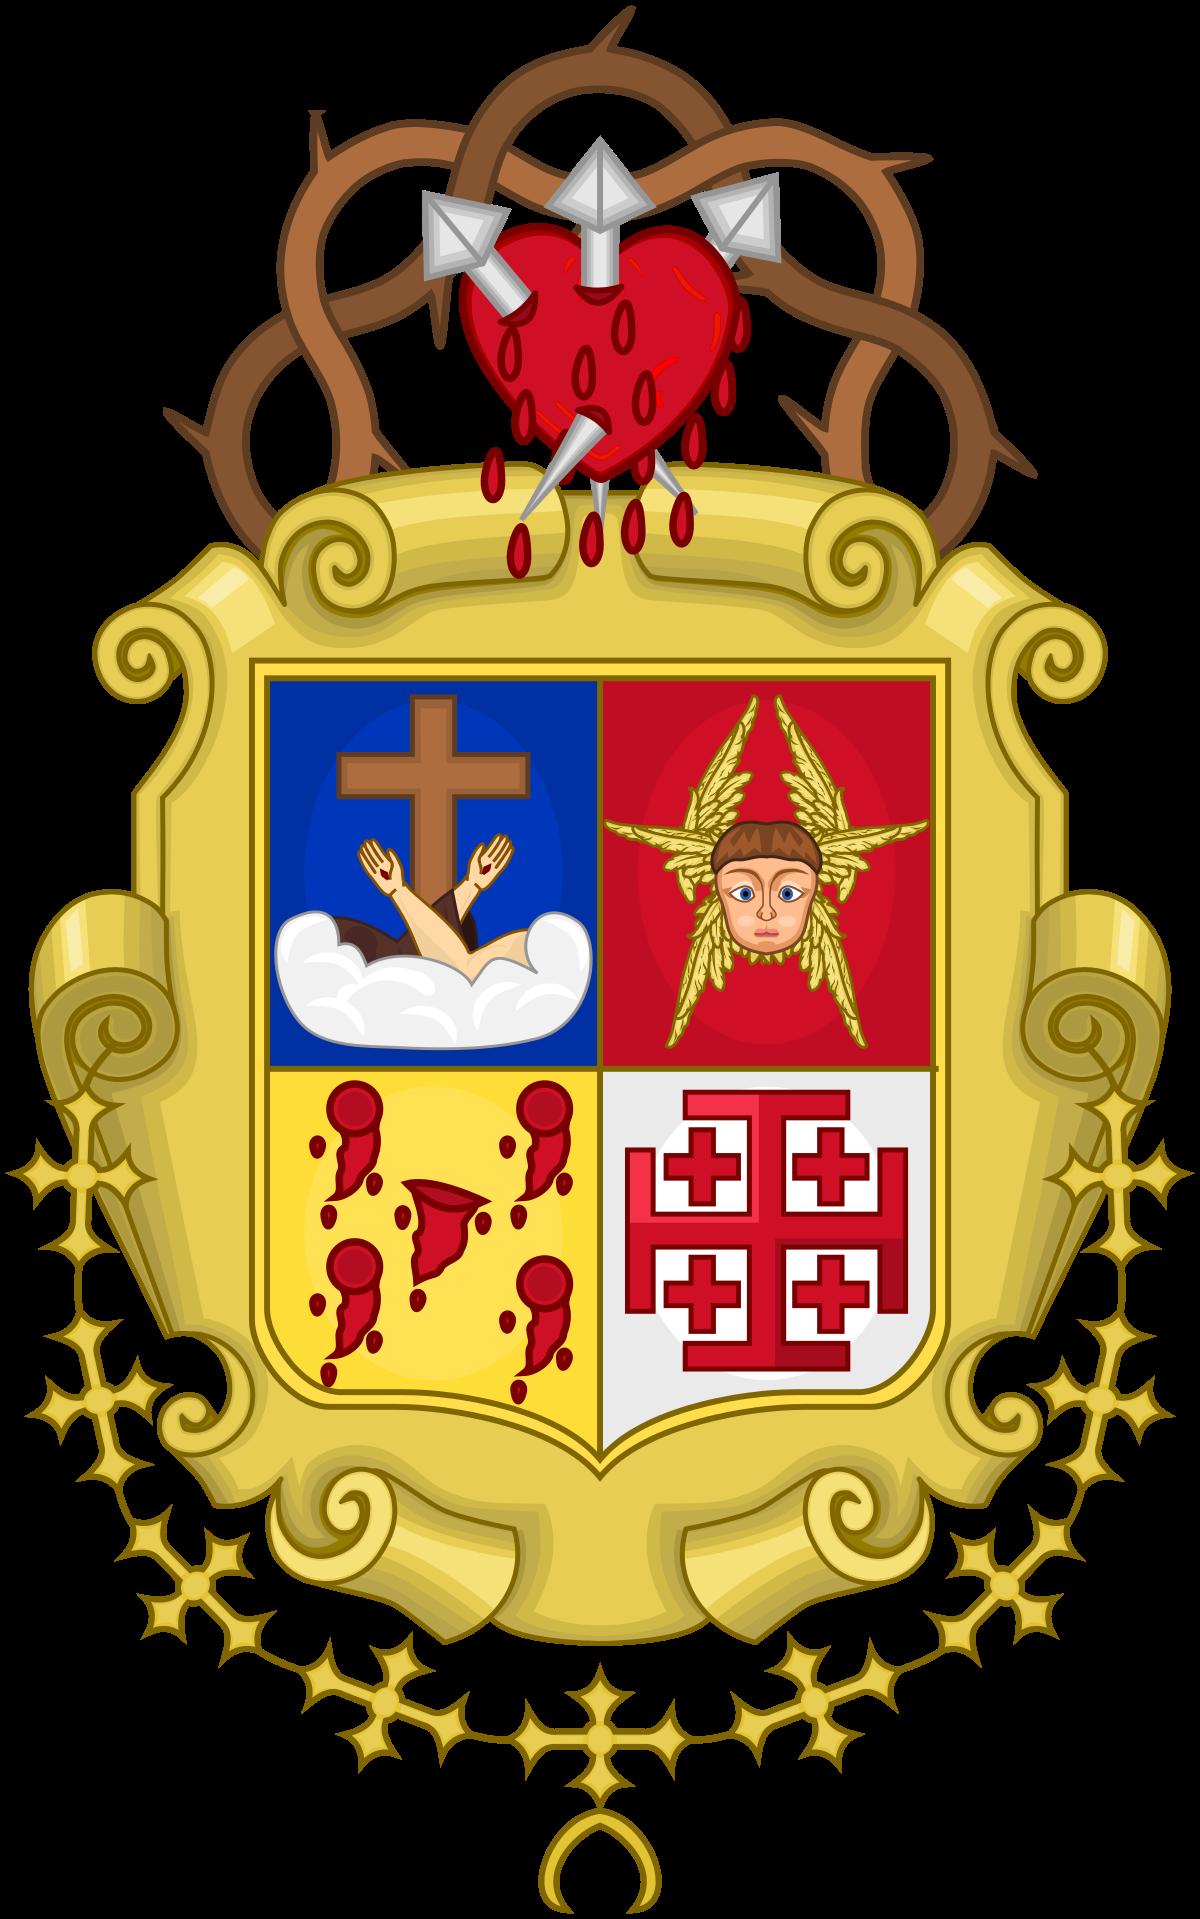 Order of Friars Minor.